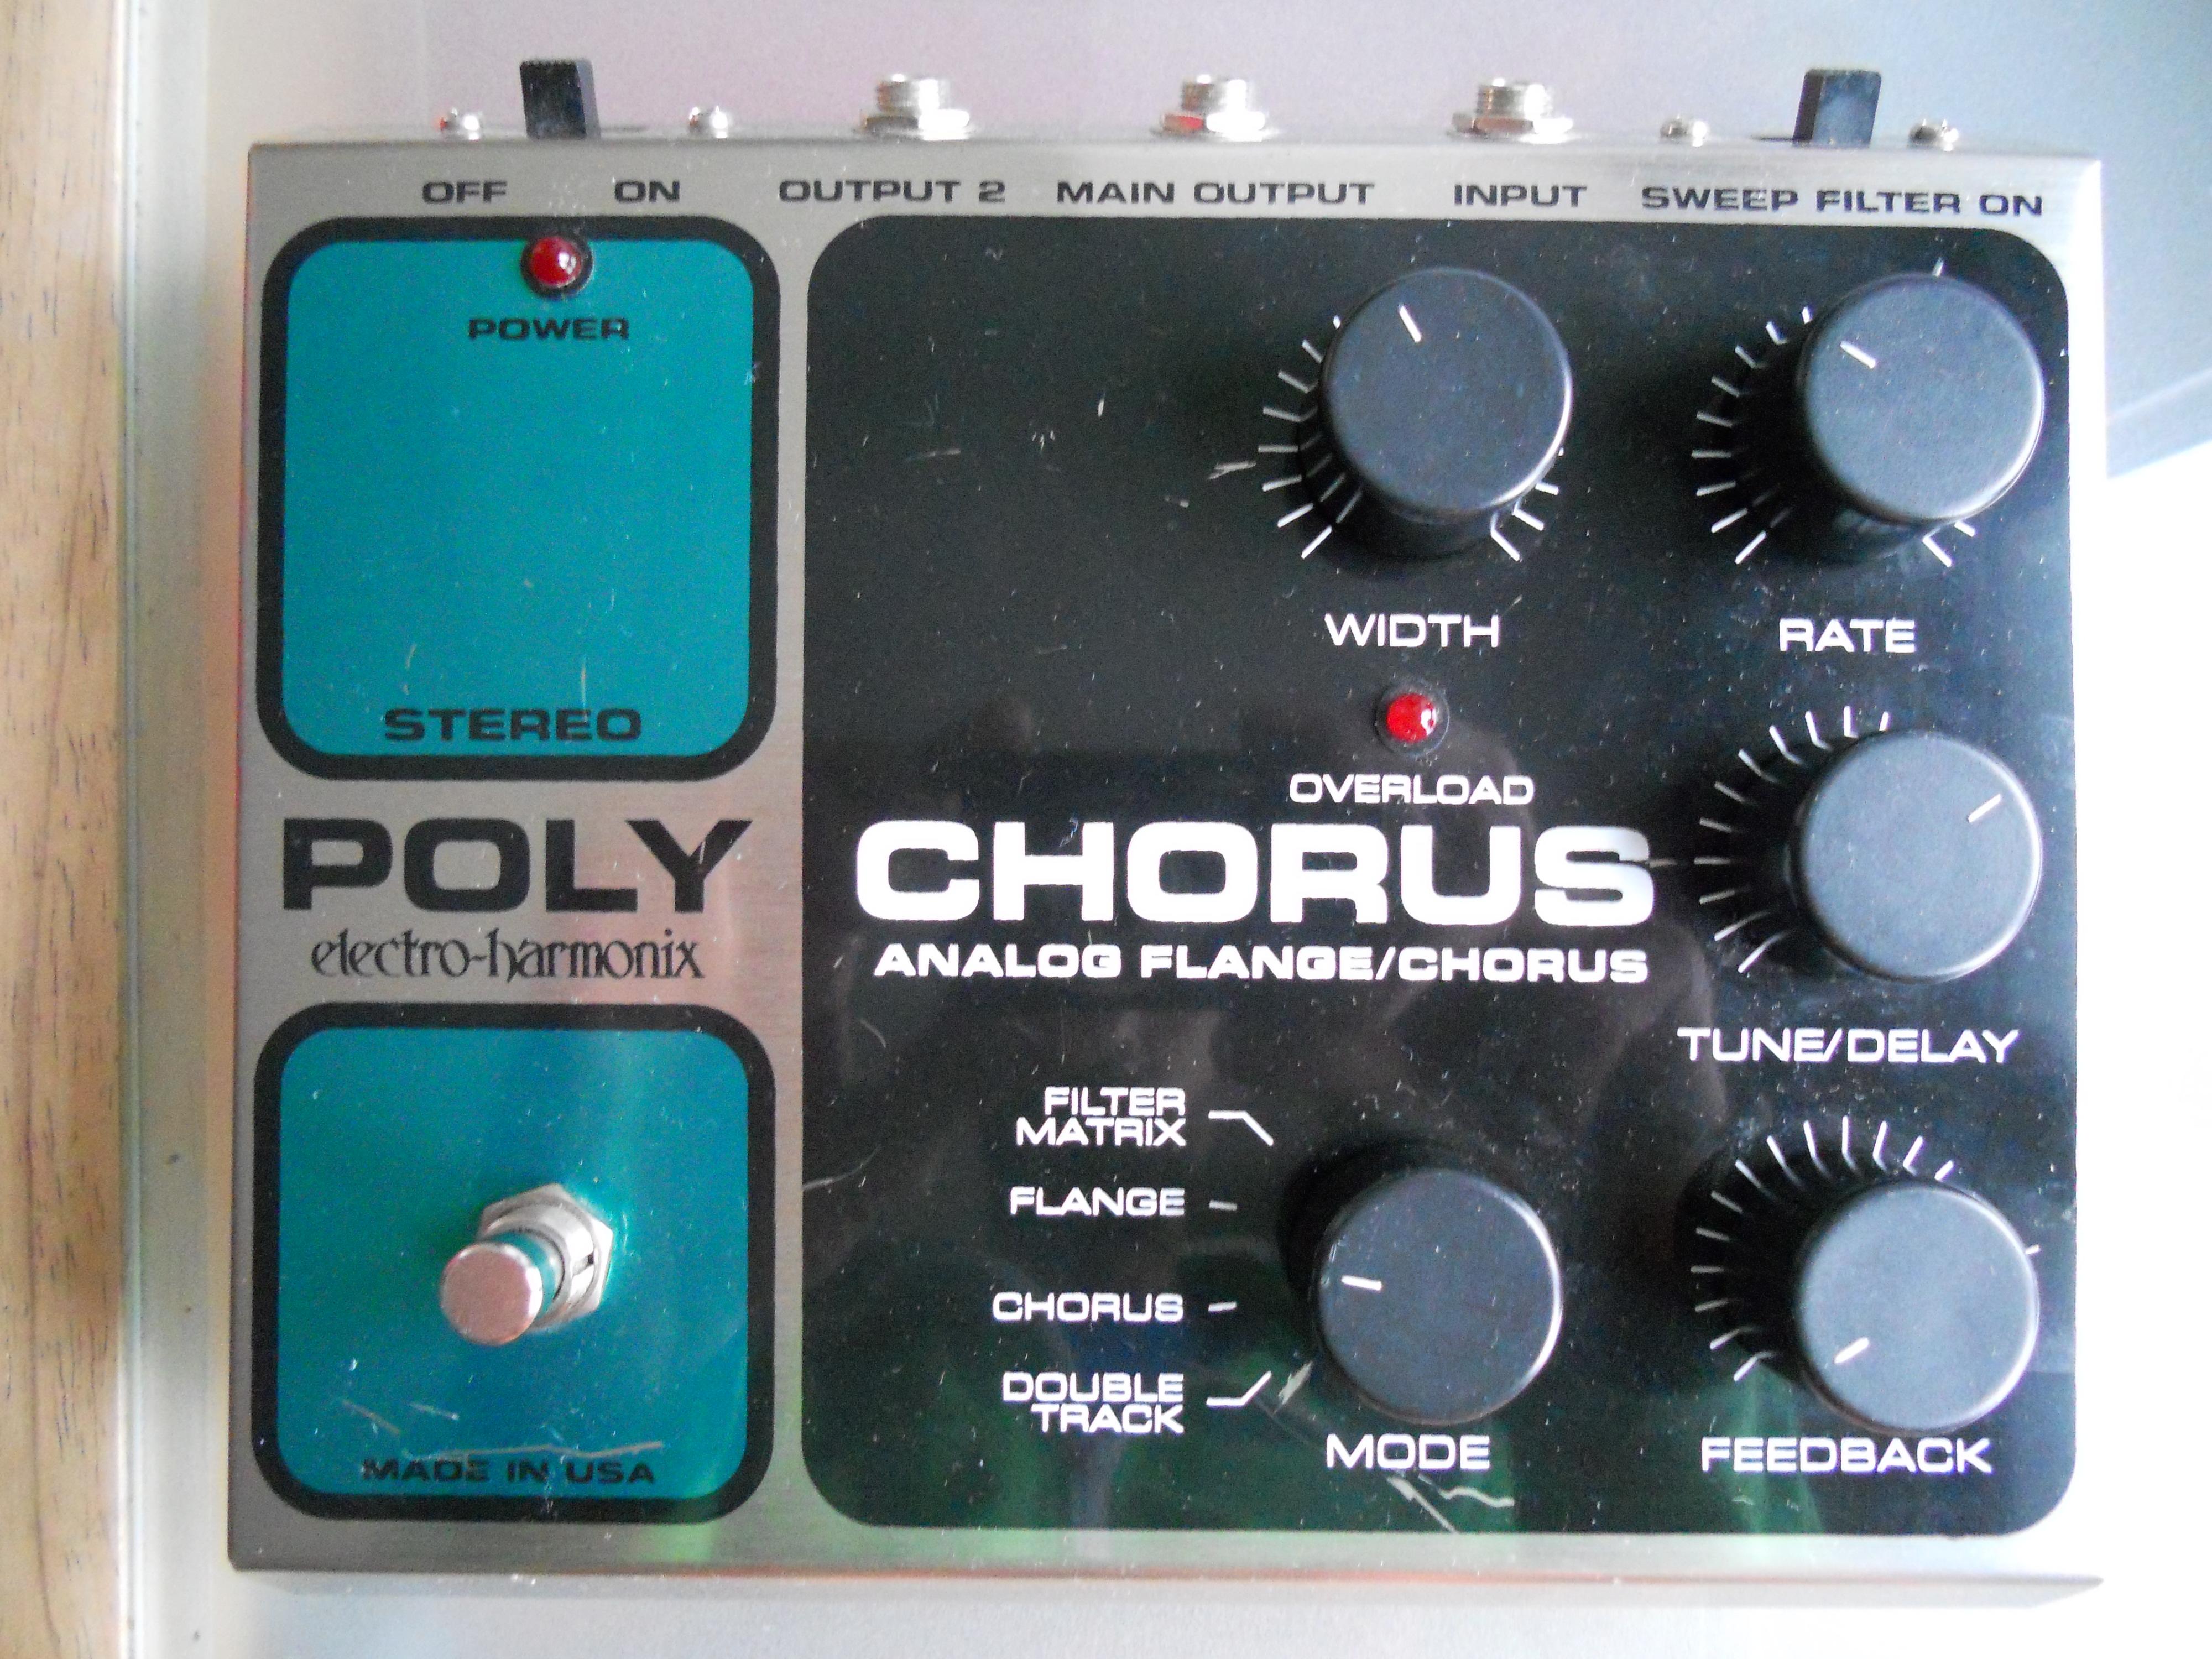 electro-harmonix-stereo-polychorus-310260.jpg